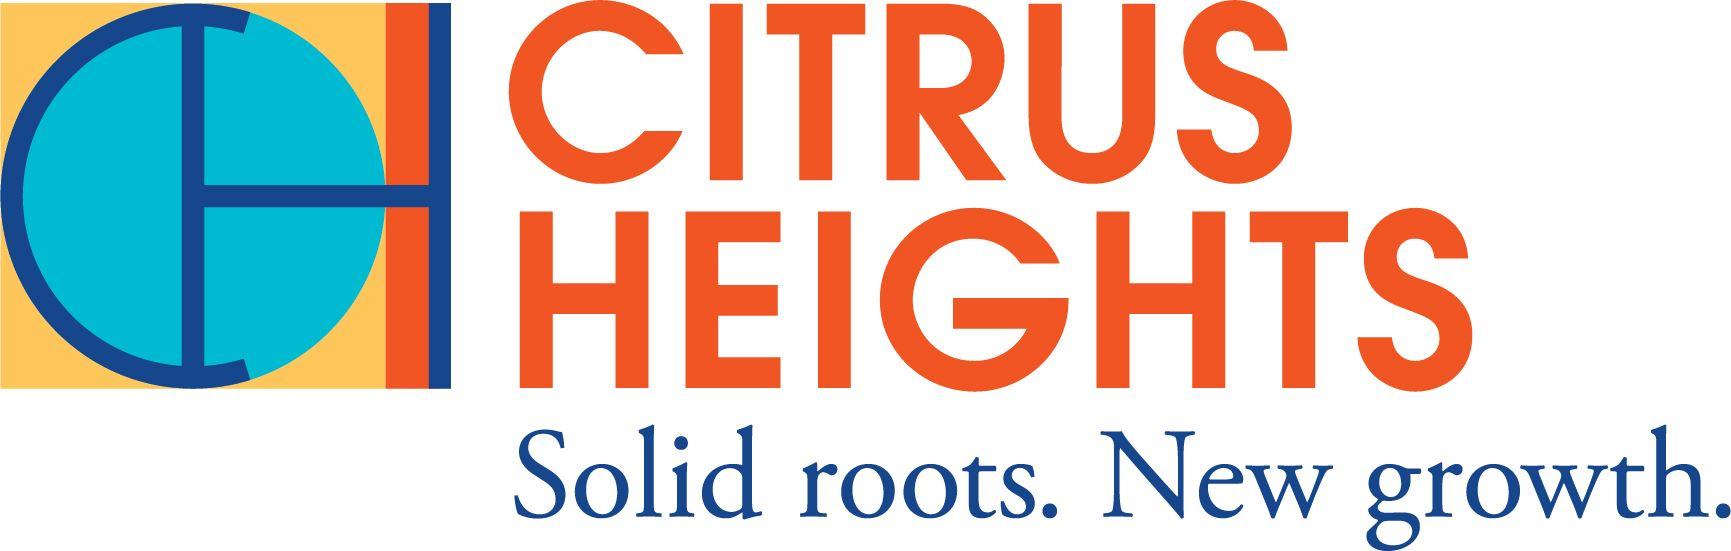 CITRUS HEIGHTS LOGO